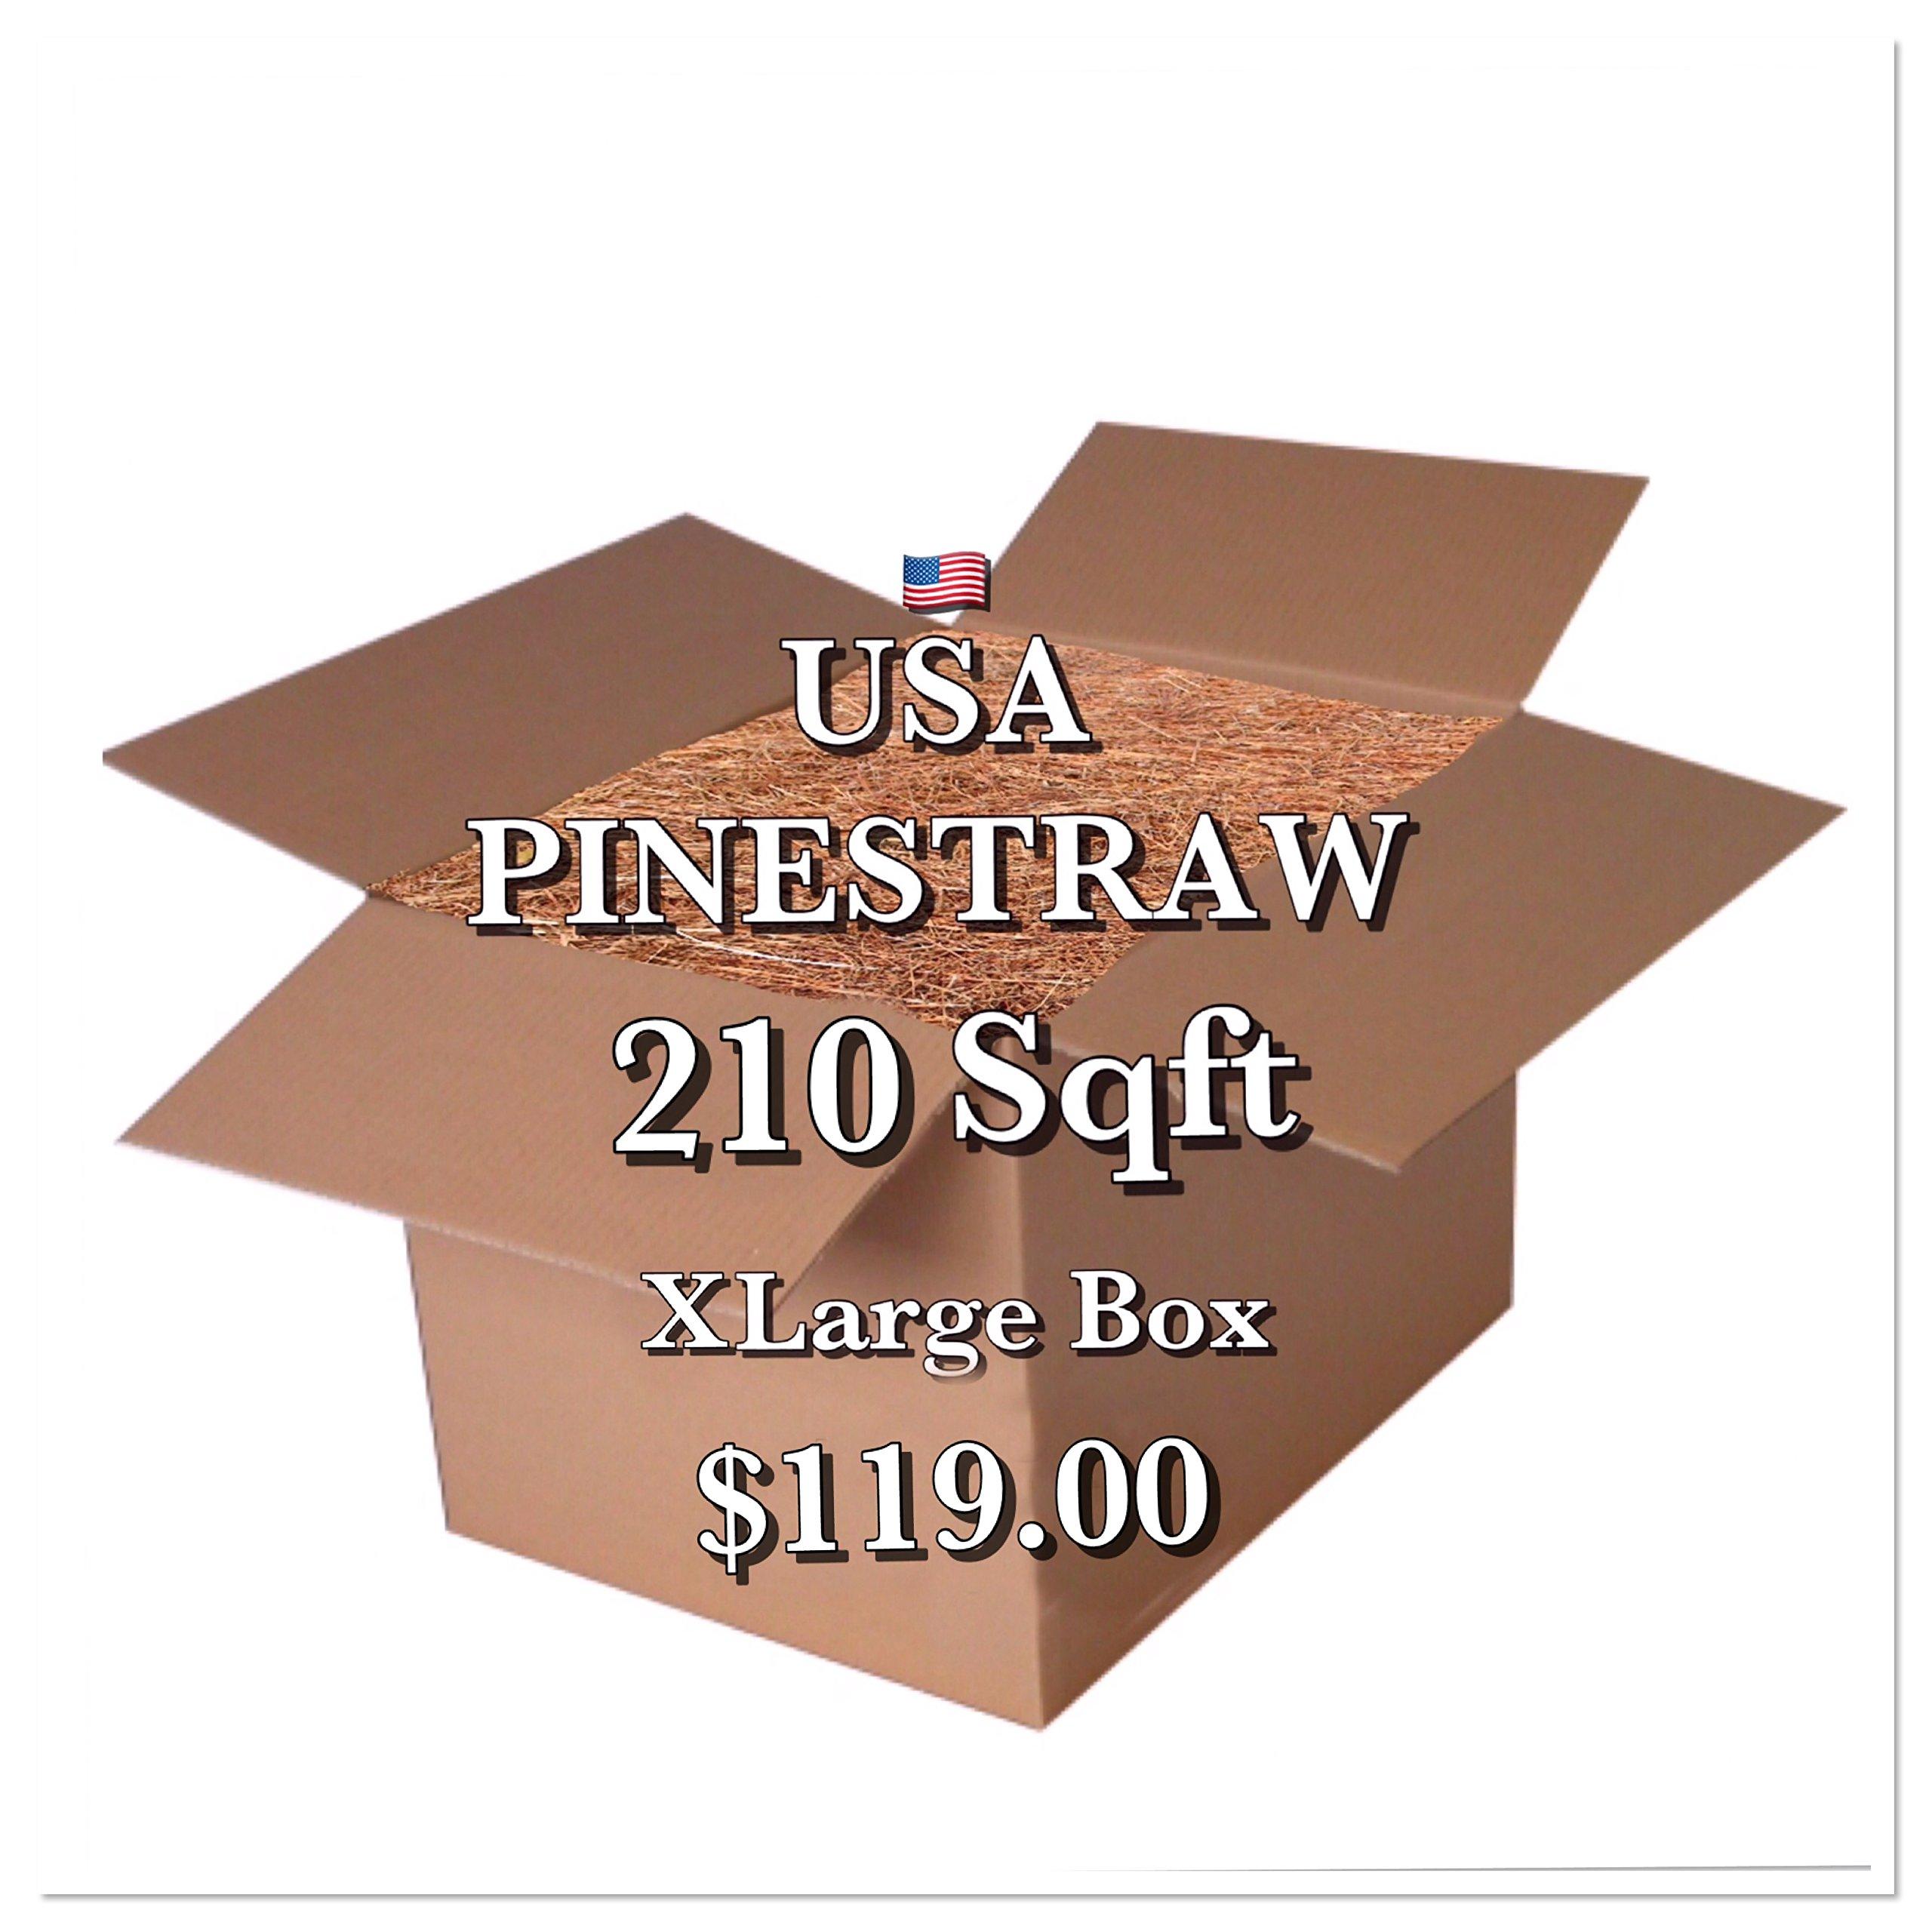 Garden Mulch - 14 '' Premium Long Needle Pinestraw - Covers up to 210 Sqft.